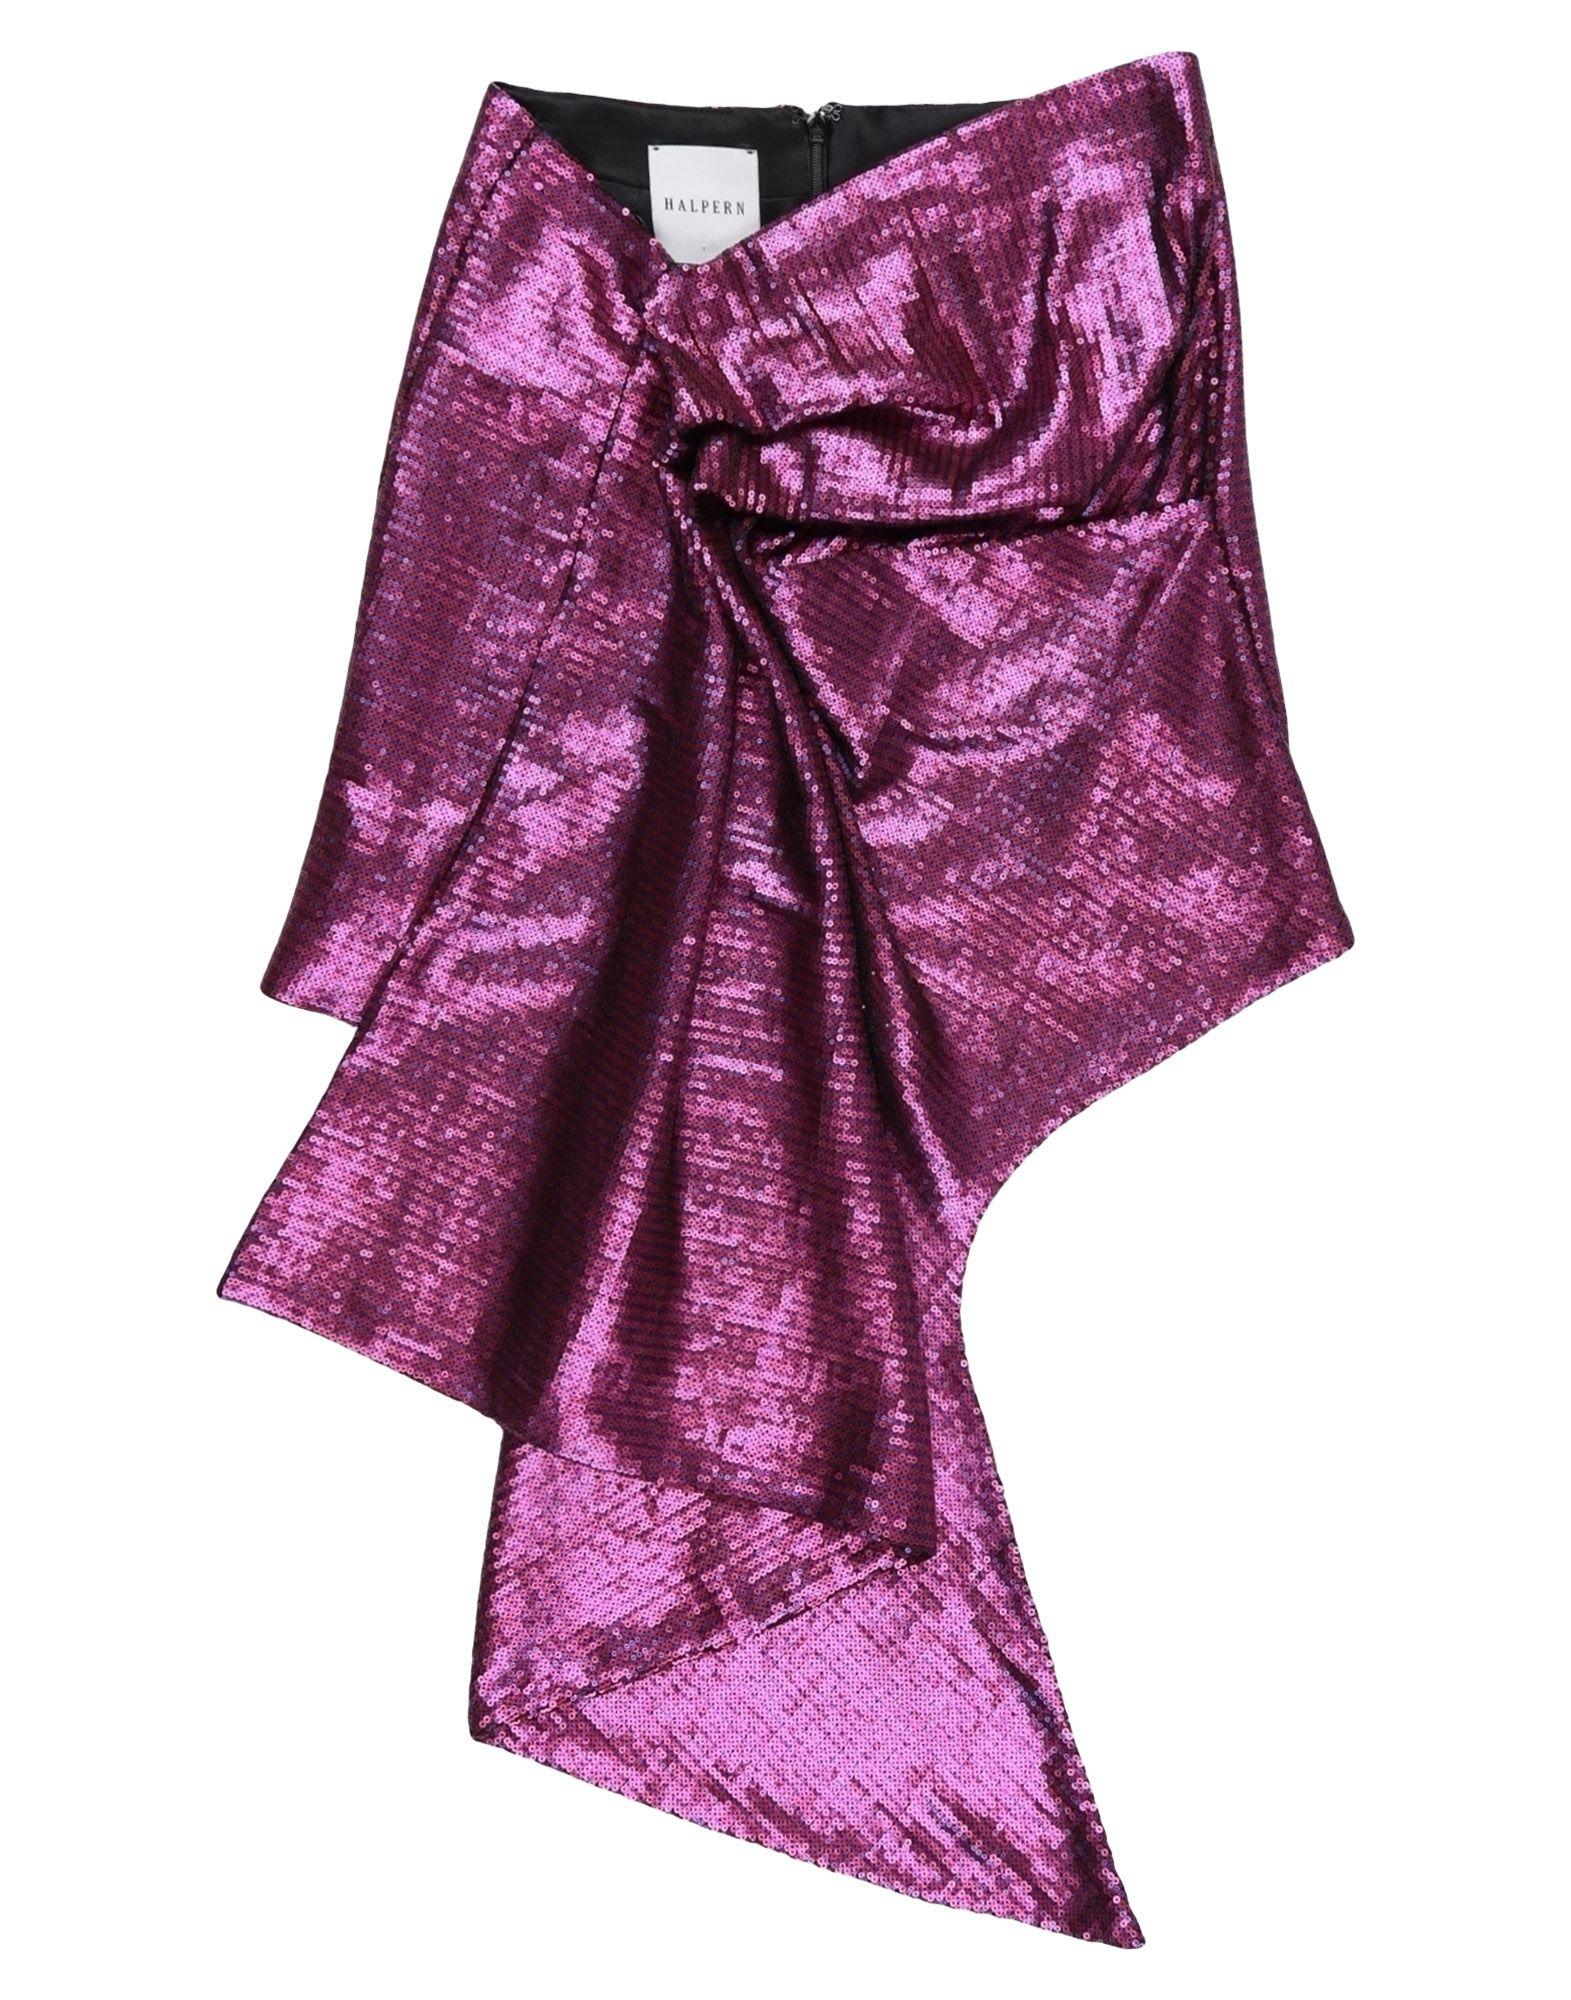 halpern блузка HALPERN Мини-юбка